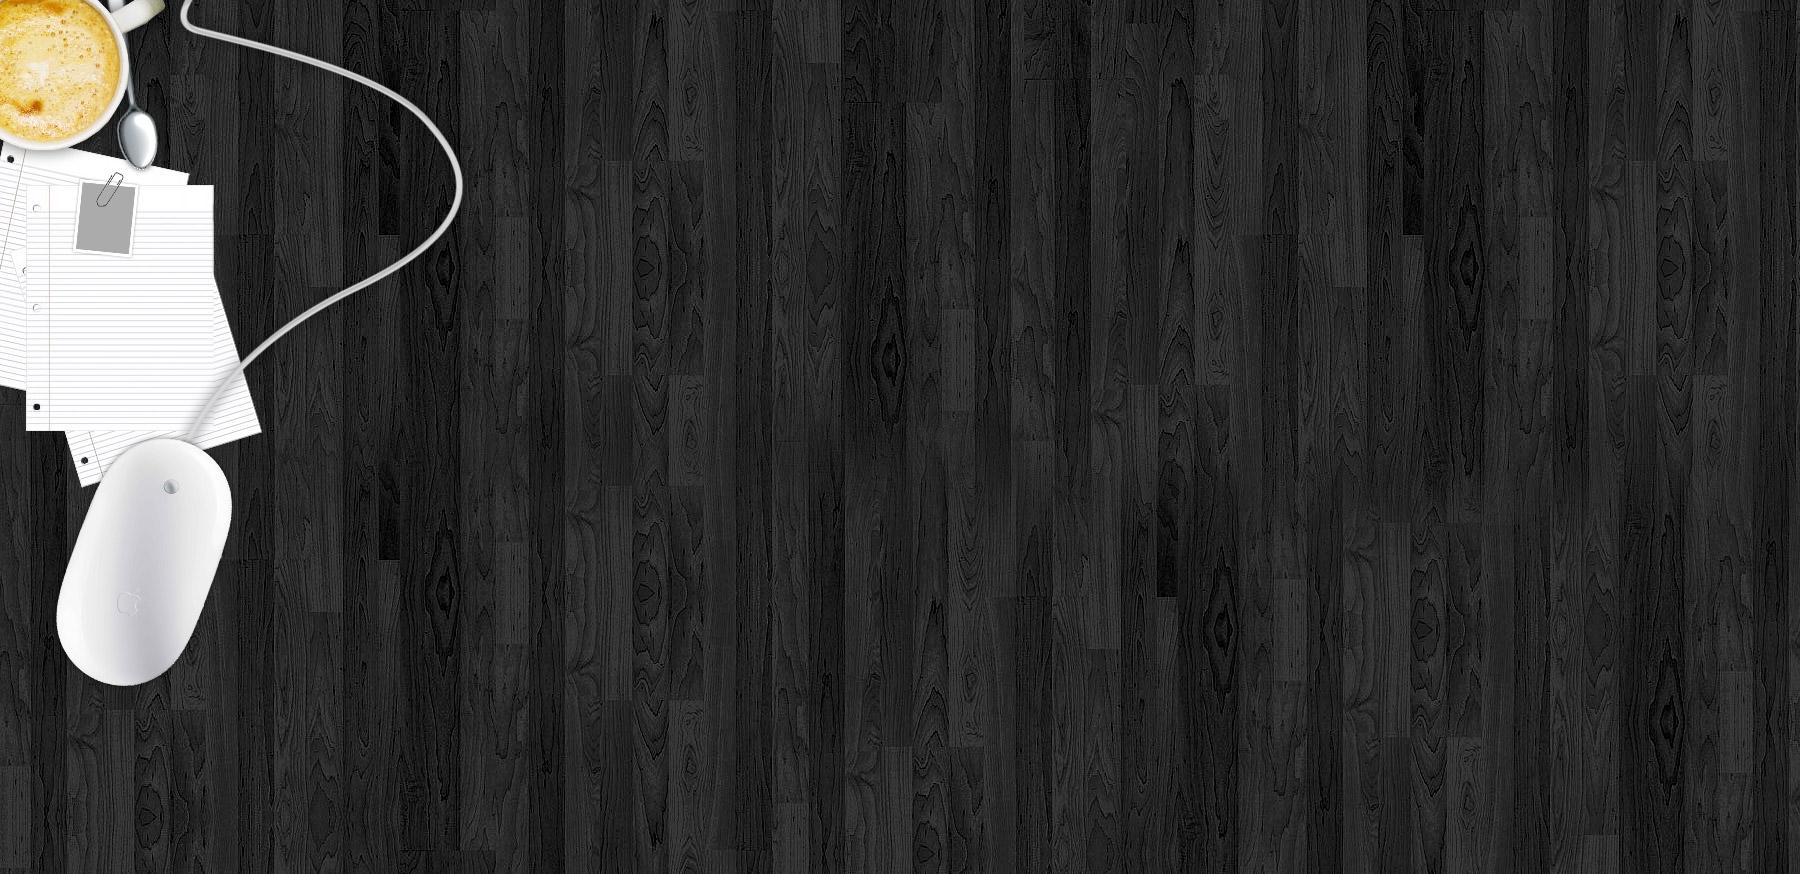 Office Desk Background By Chocotemplates On Deviantart